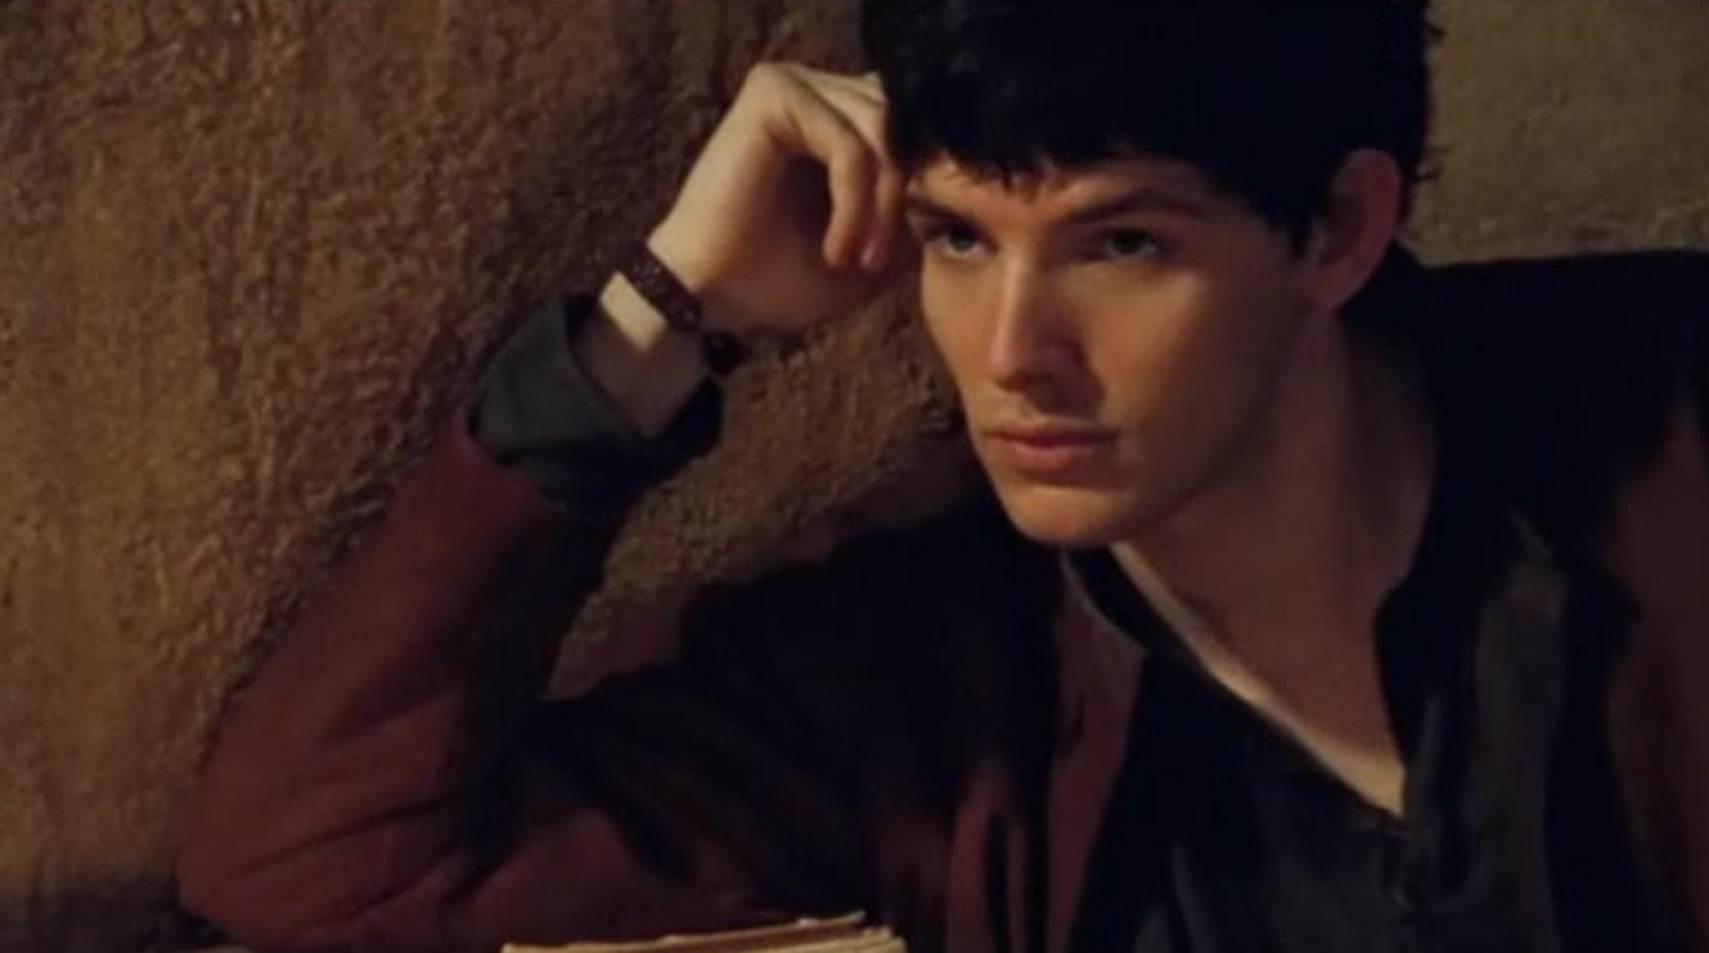 Merlin season 1 episode 7 2008 -  Merlin Season 4 Episode 1 Merlin Characters Merlin Wallpaper